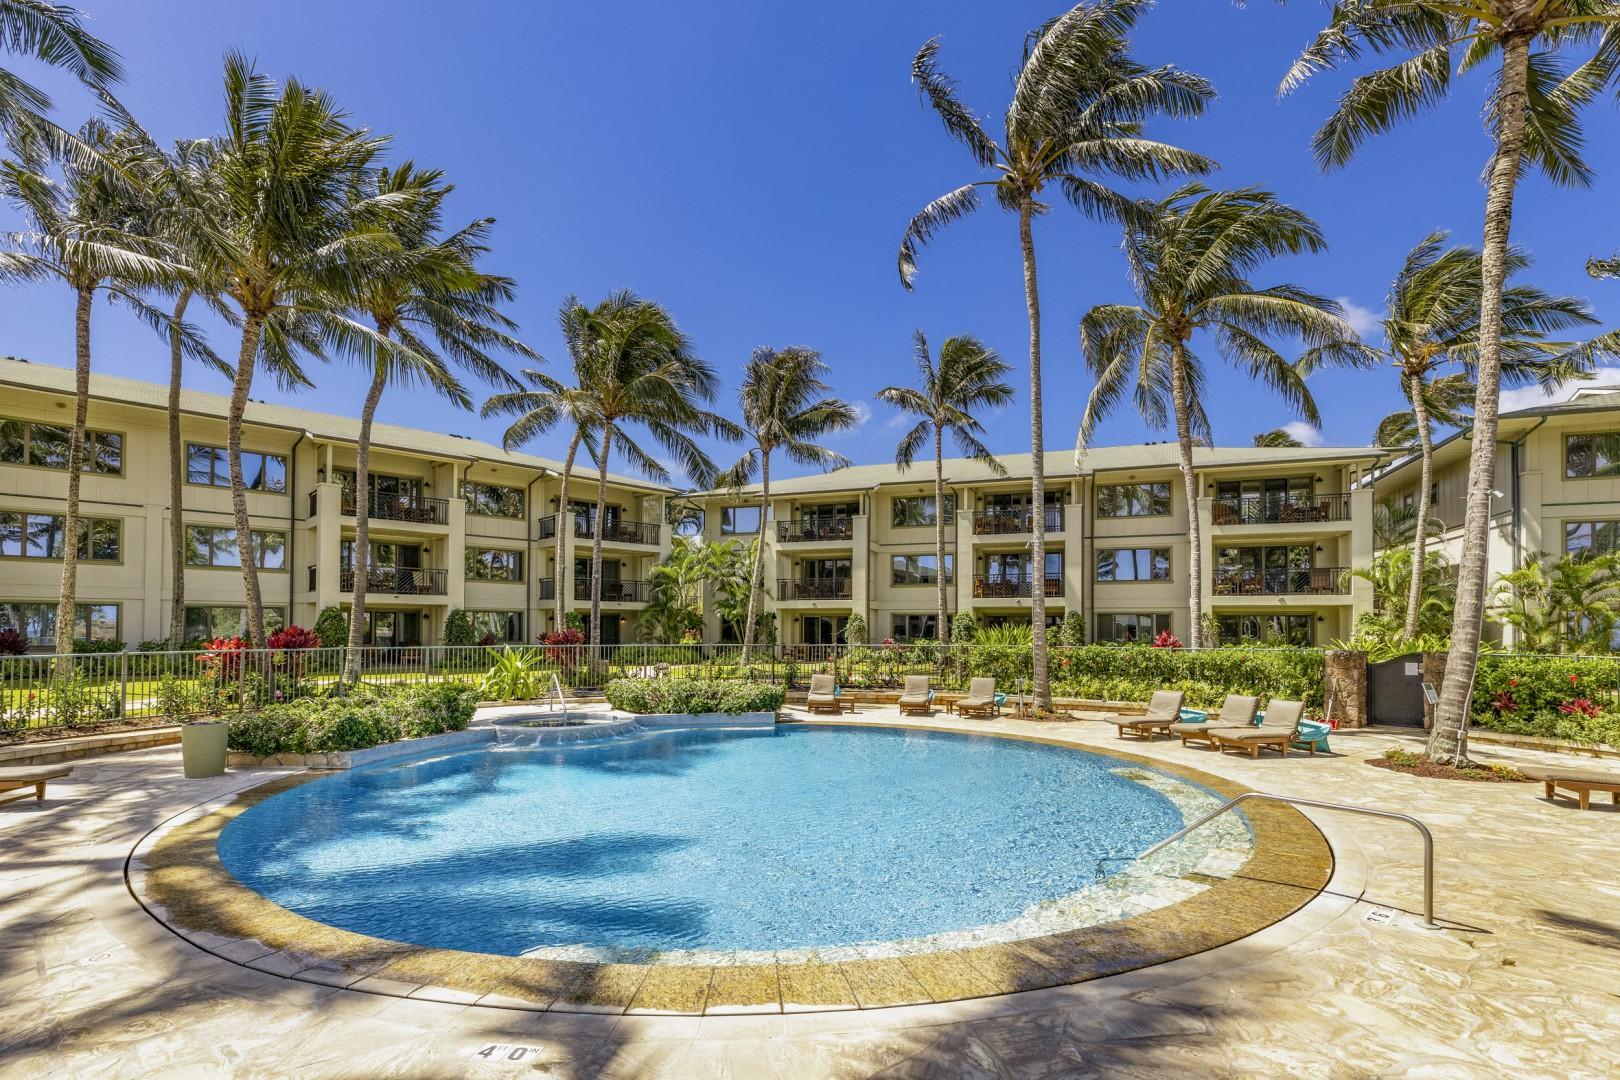 Ocean Villa Pool & Jacuzzi